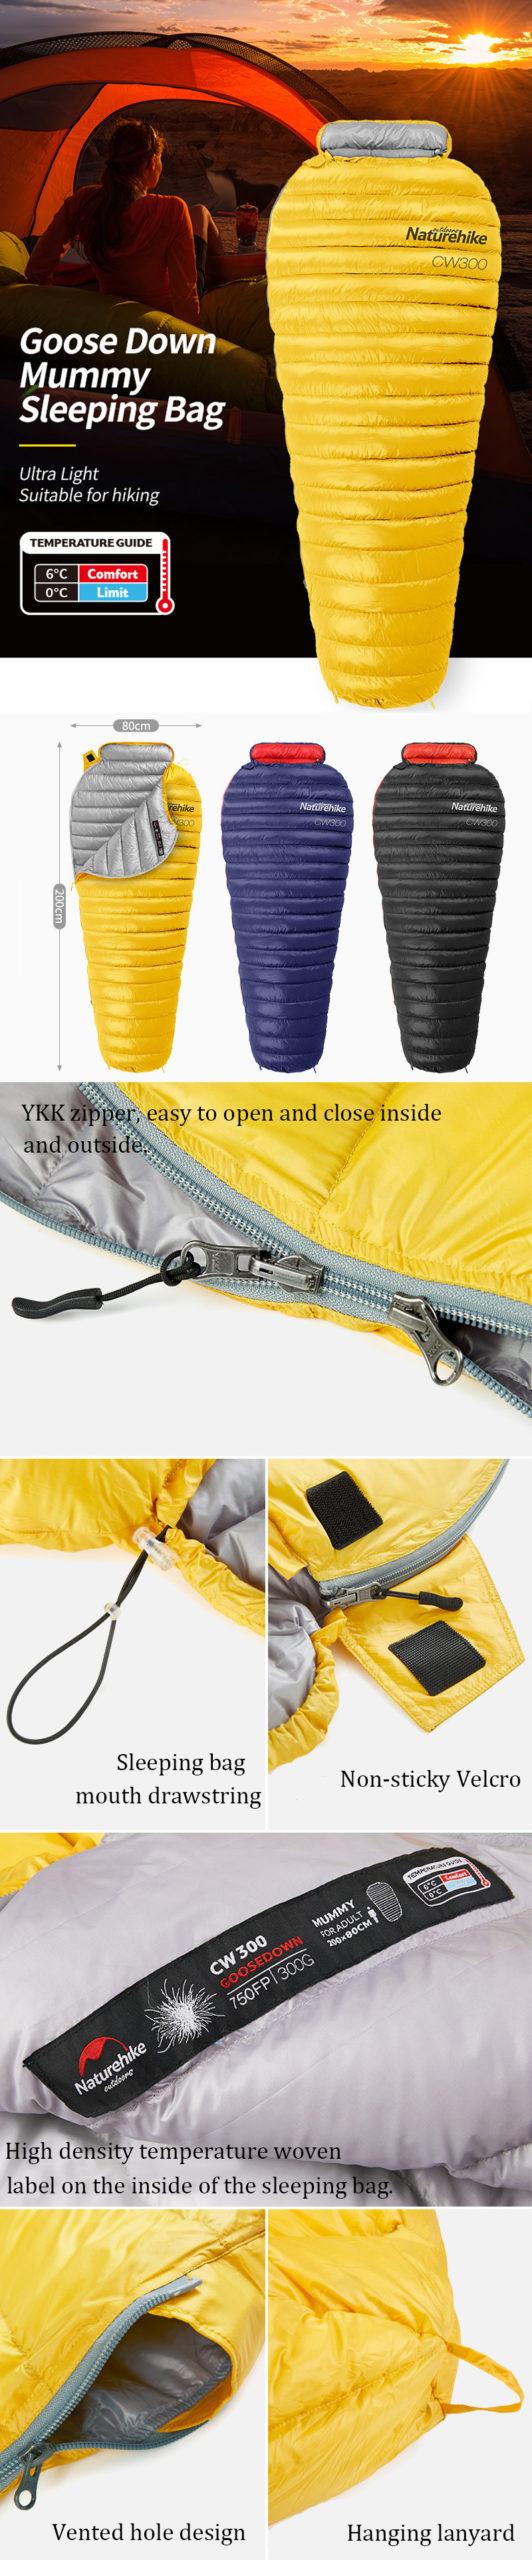 goose down sleeping bag features